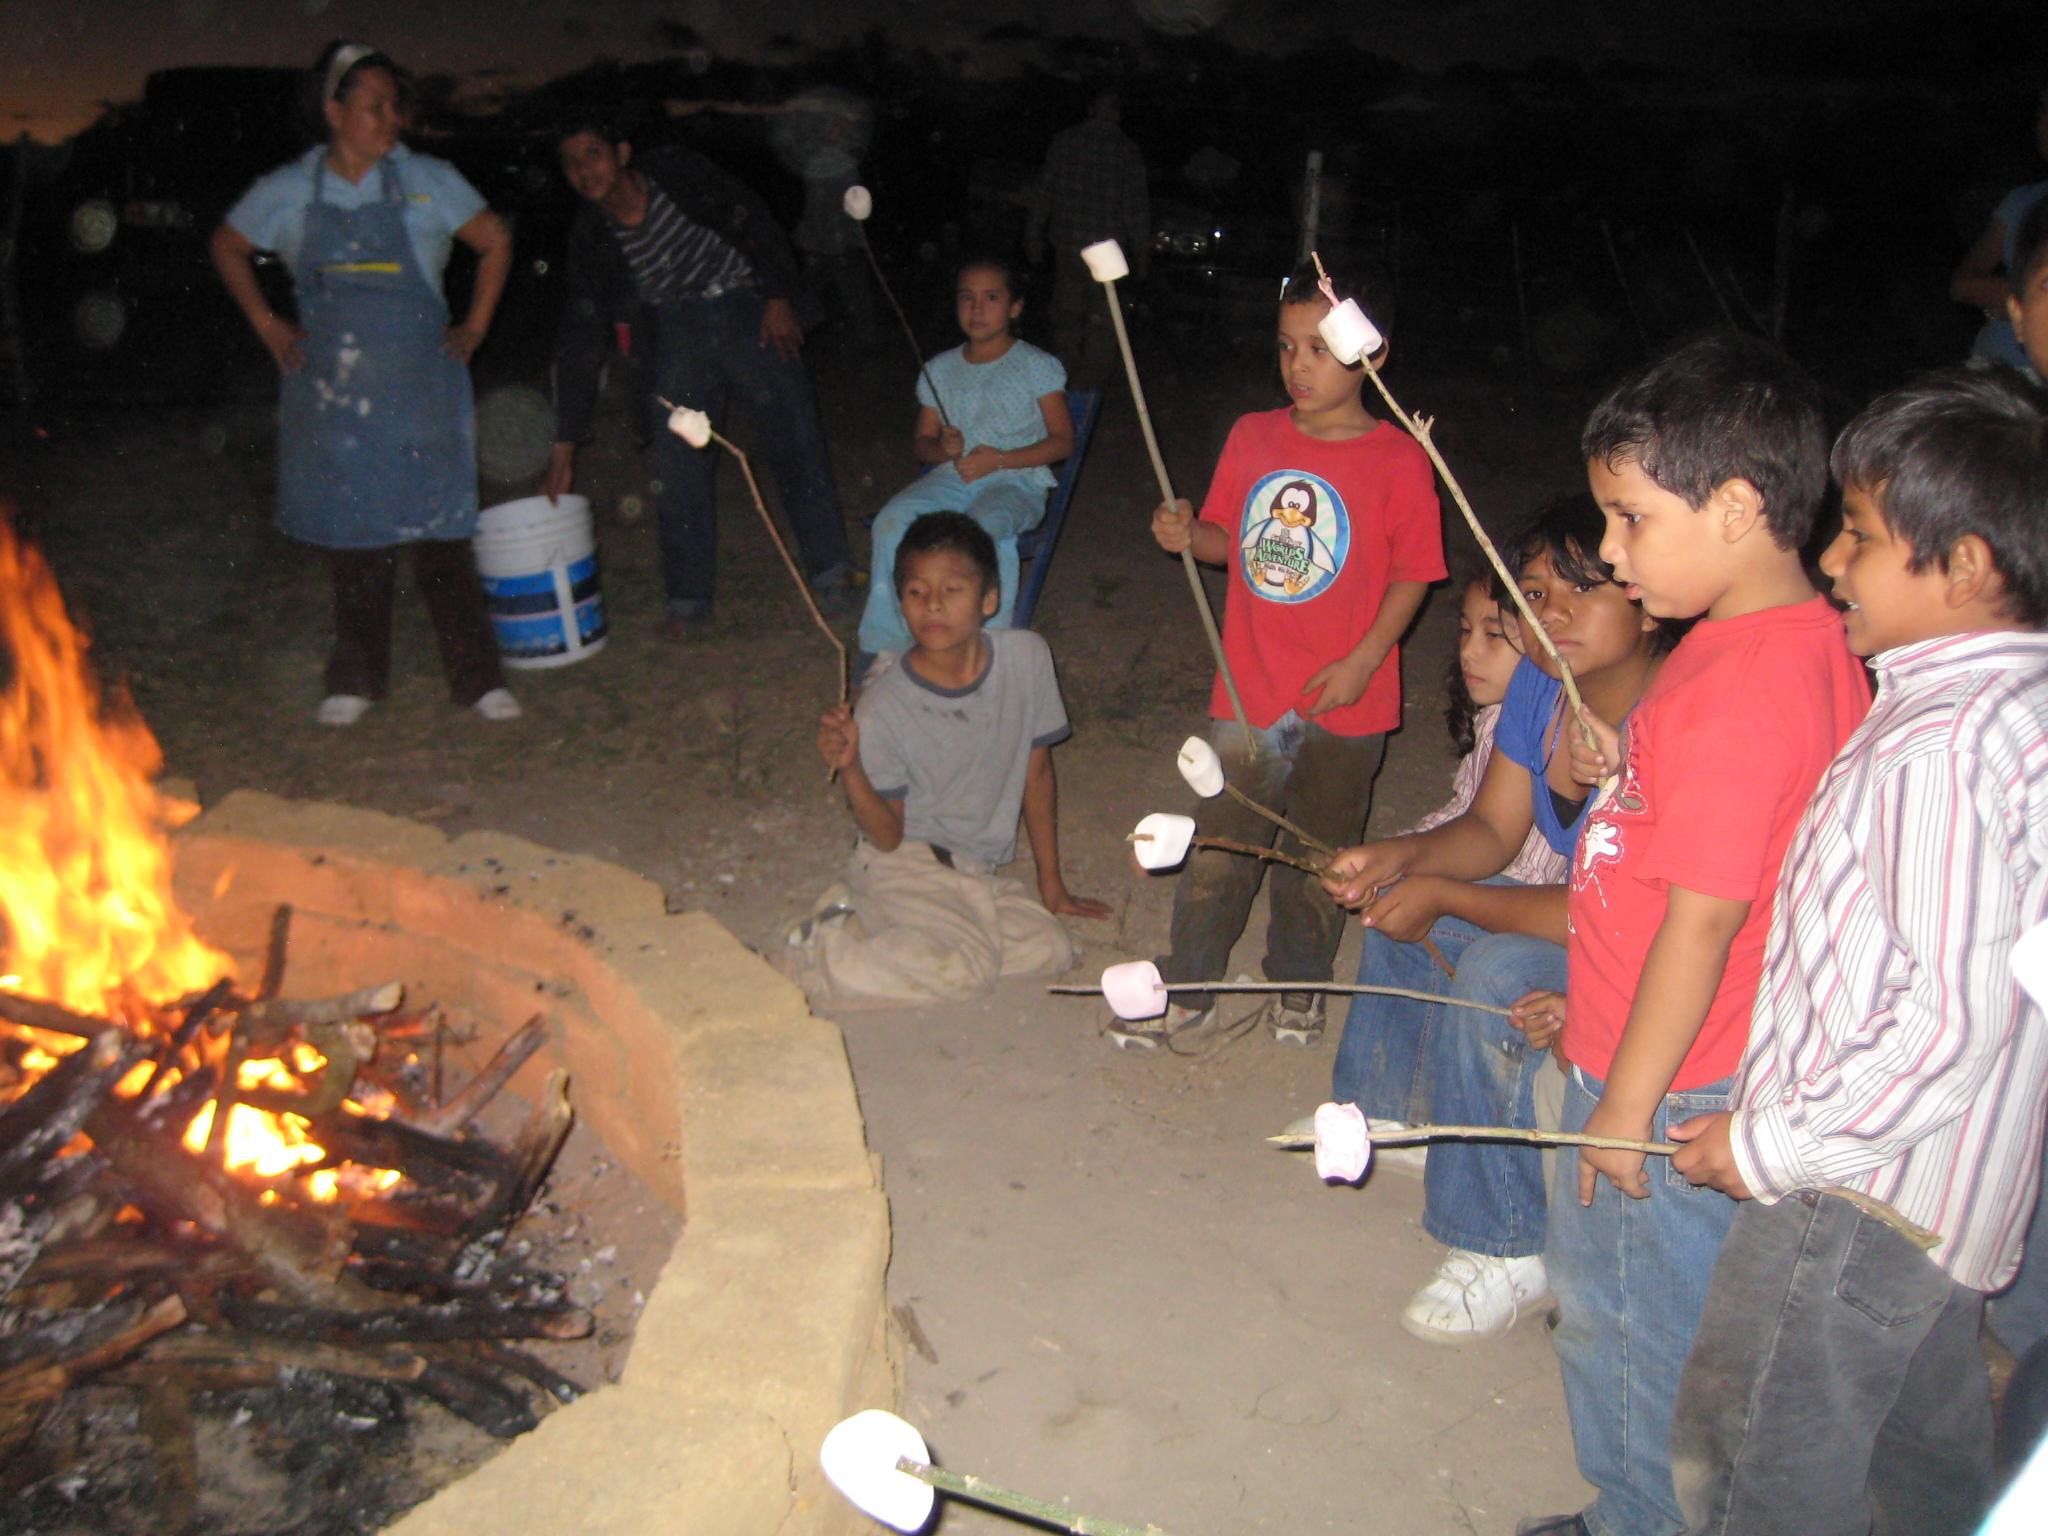 Ranch picnic, Jacibe, Isela 025